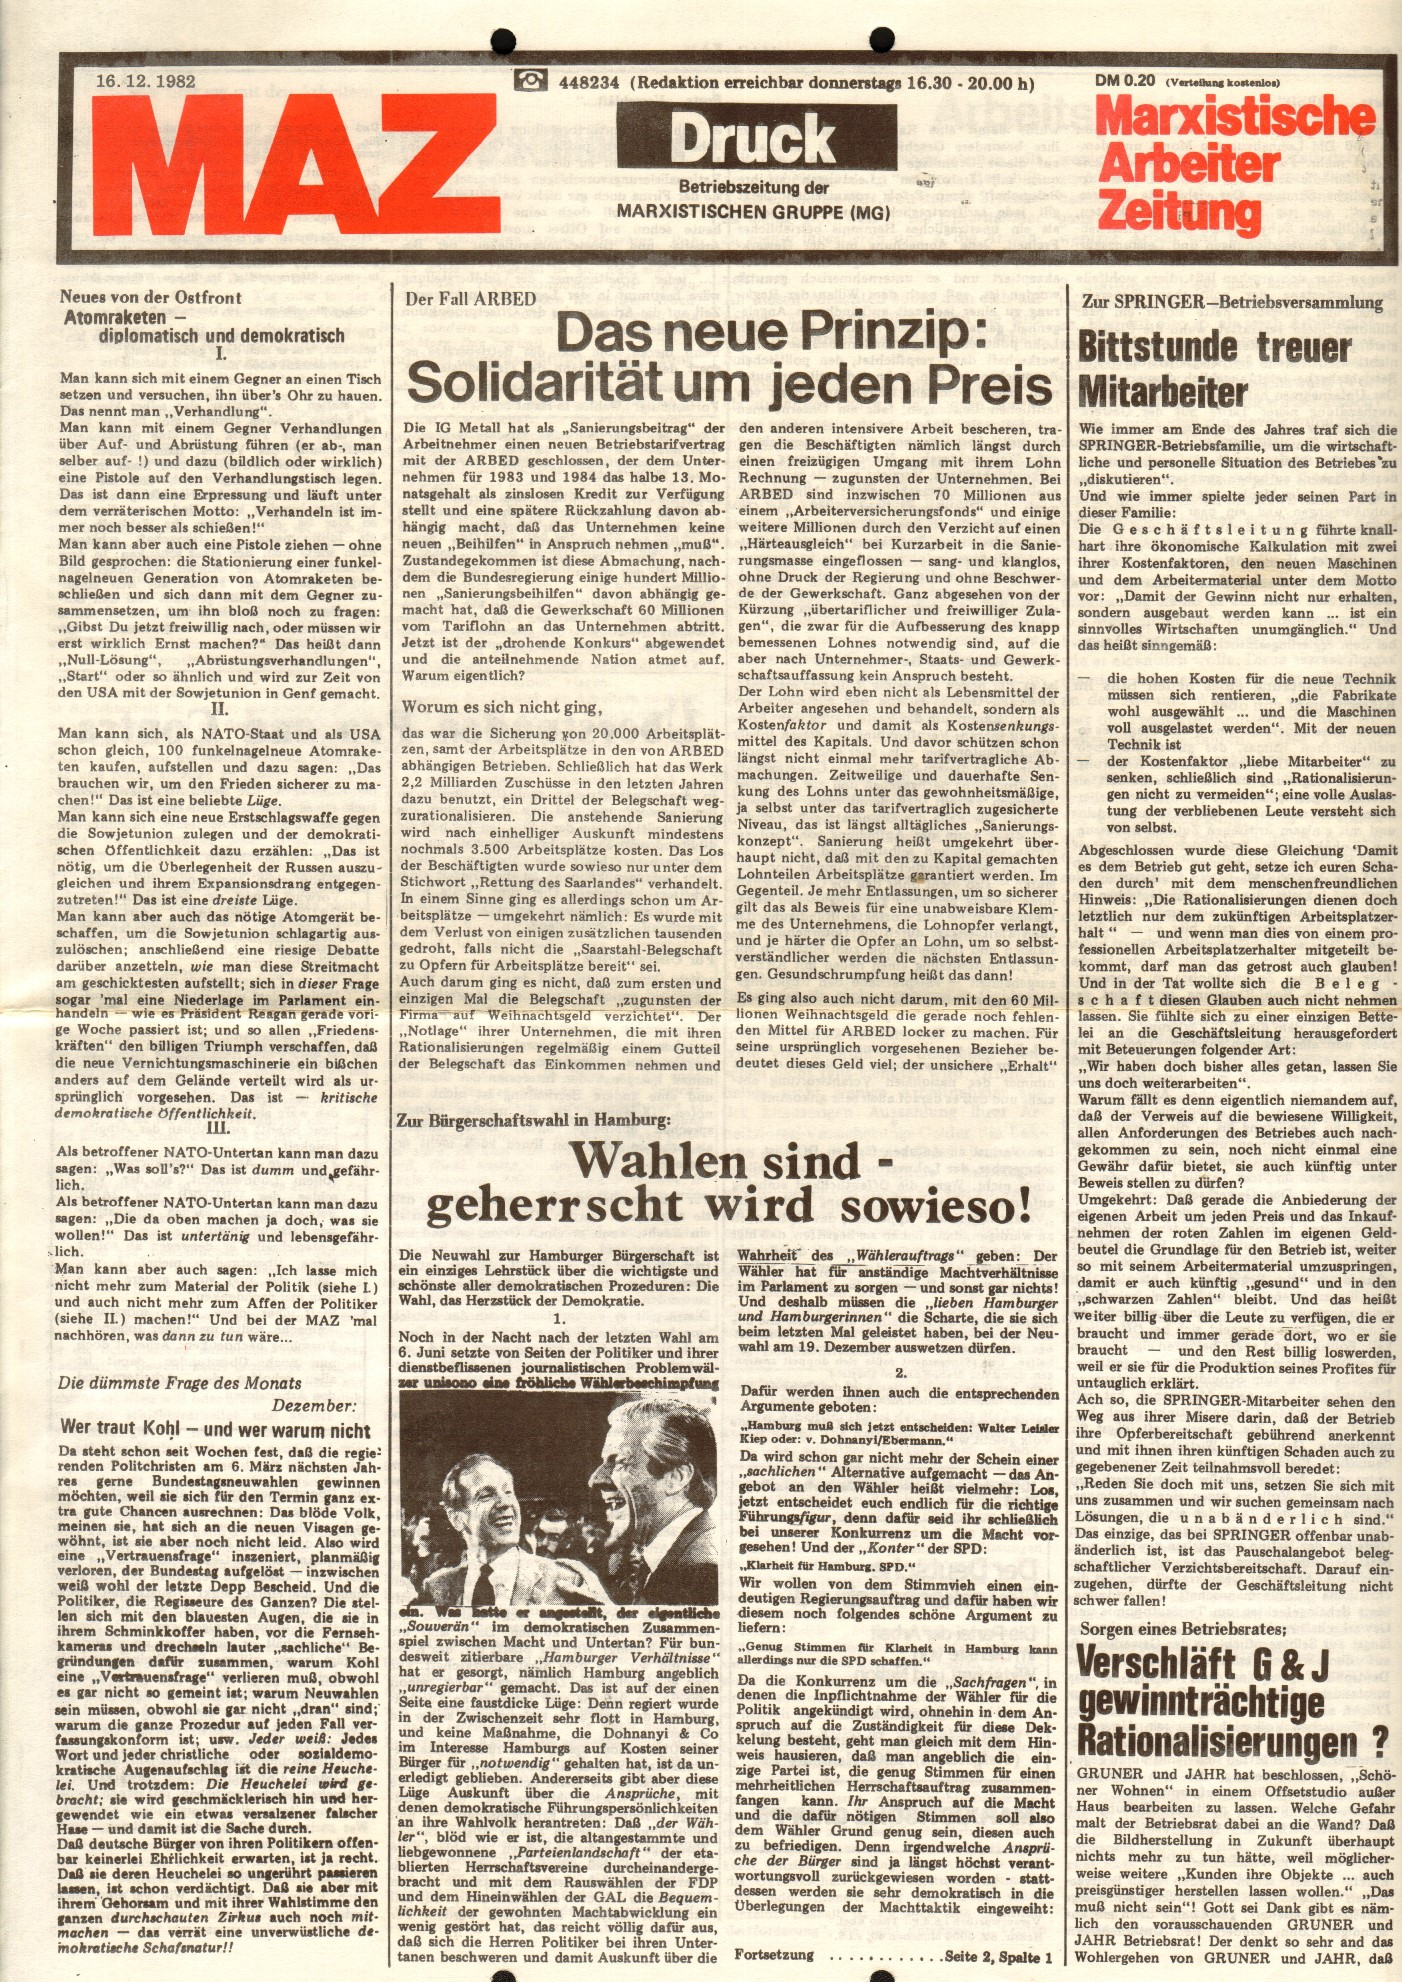 Hamburg_MG_MAZ_Druck_19821216_01